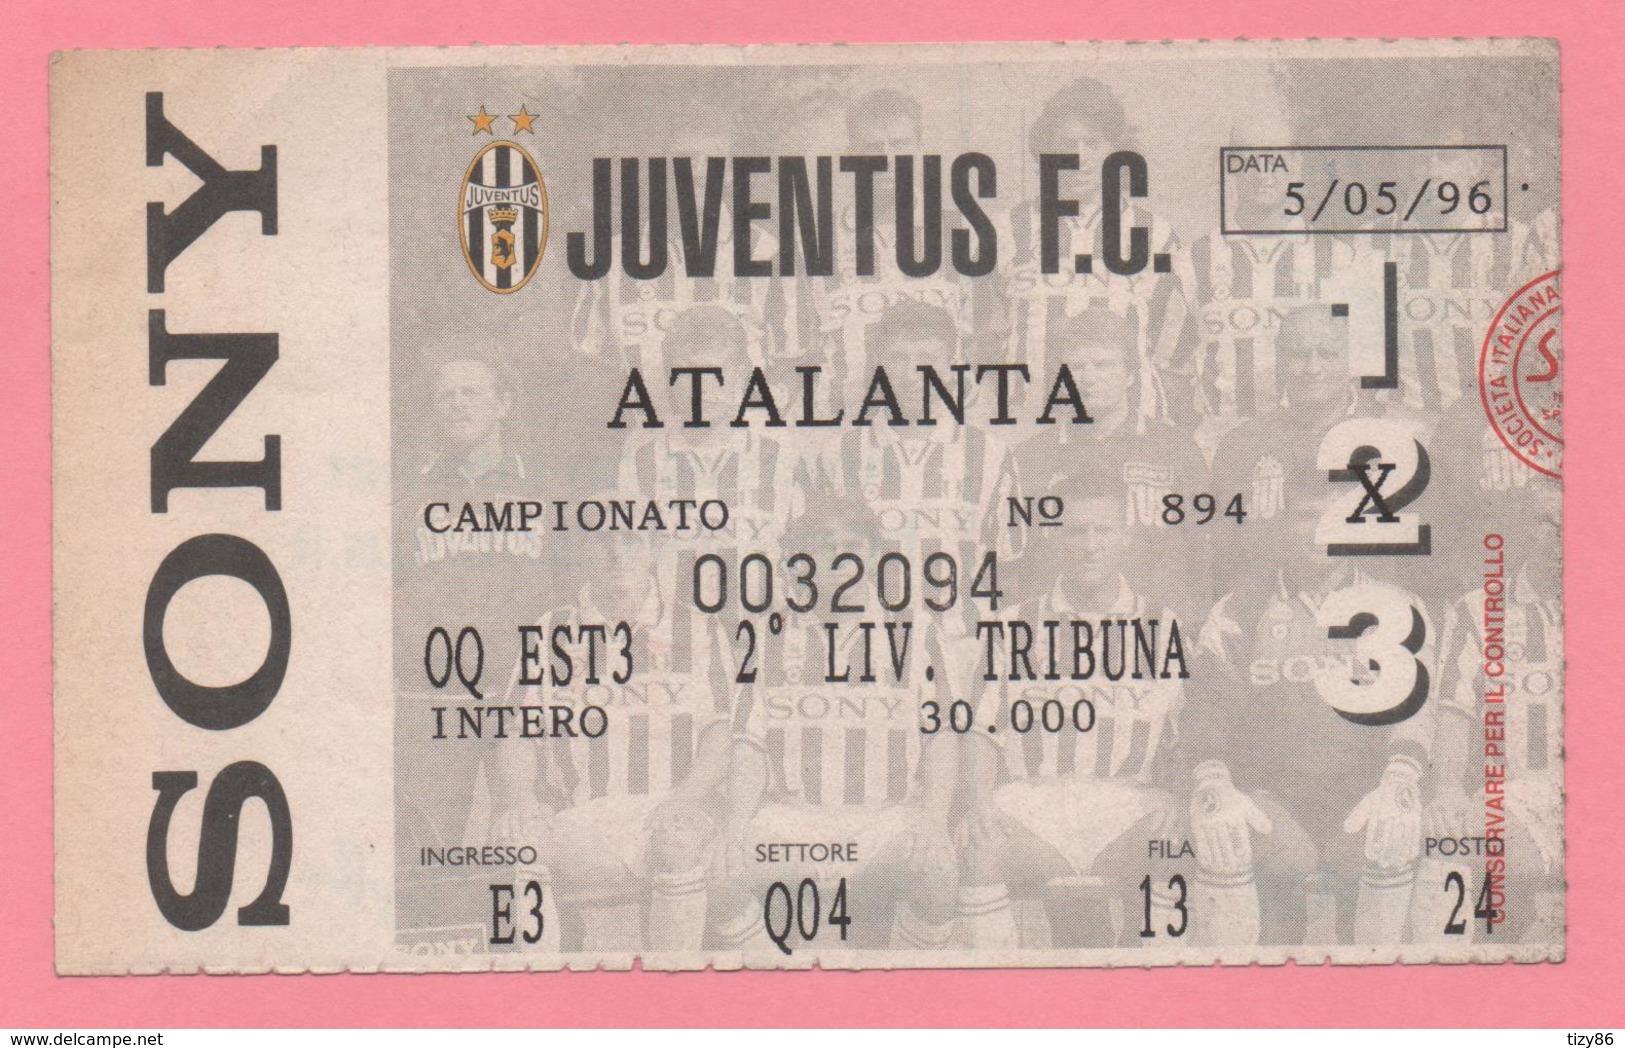 Biglietto D'ingresso Juventus F.C. Atalanta 1996 - Tickets - Entradas